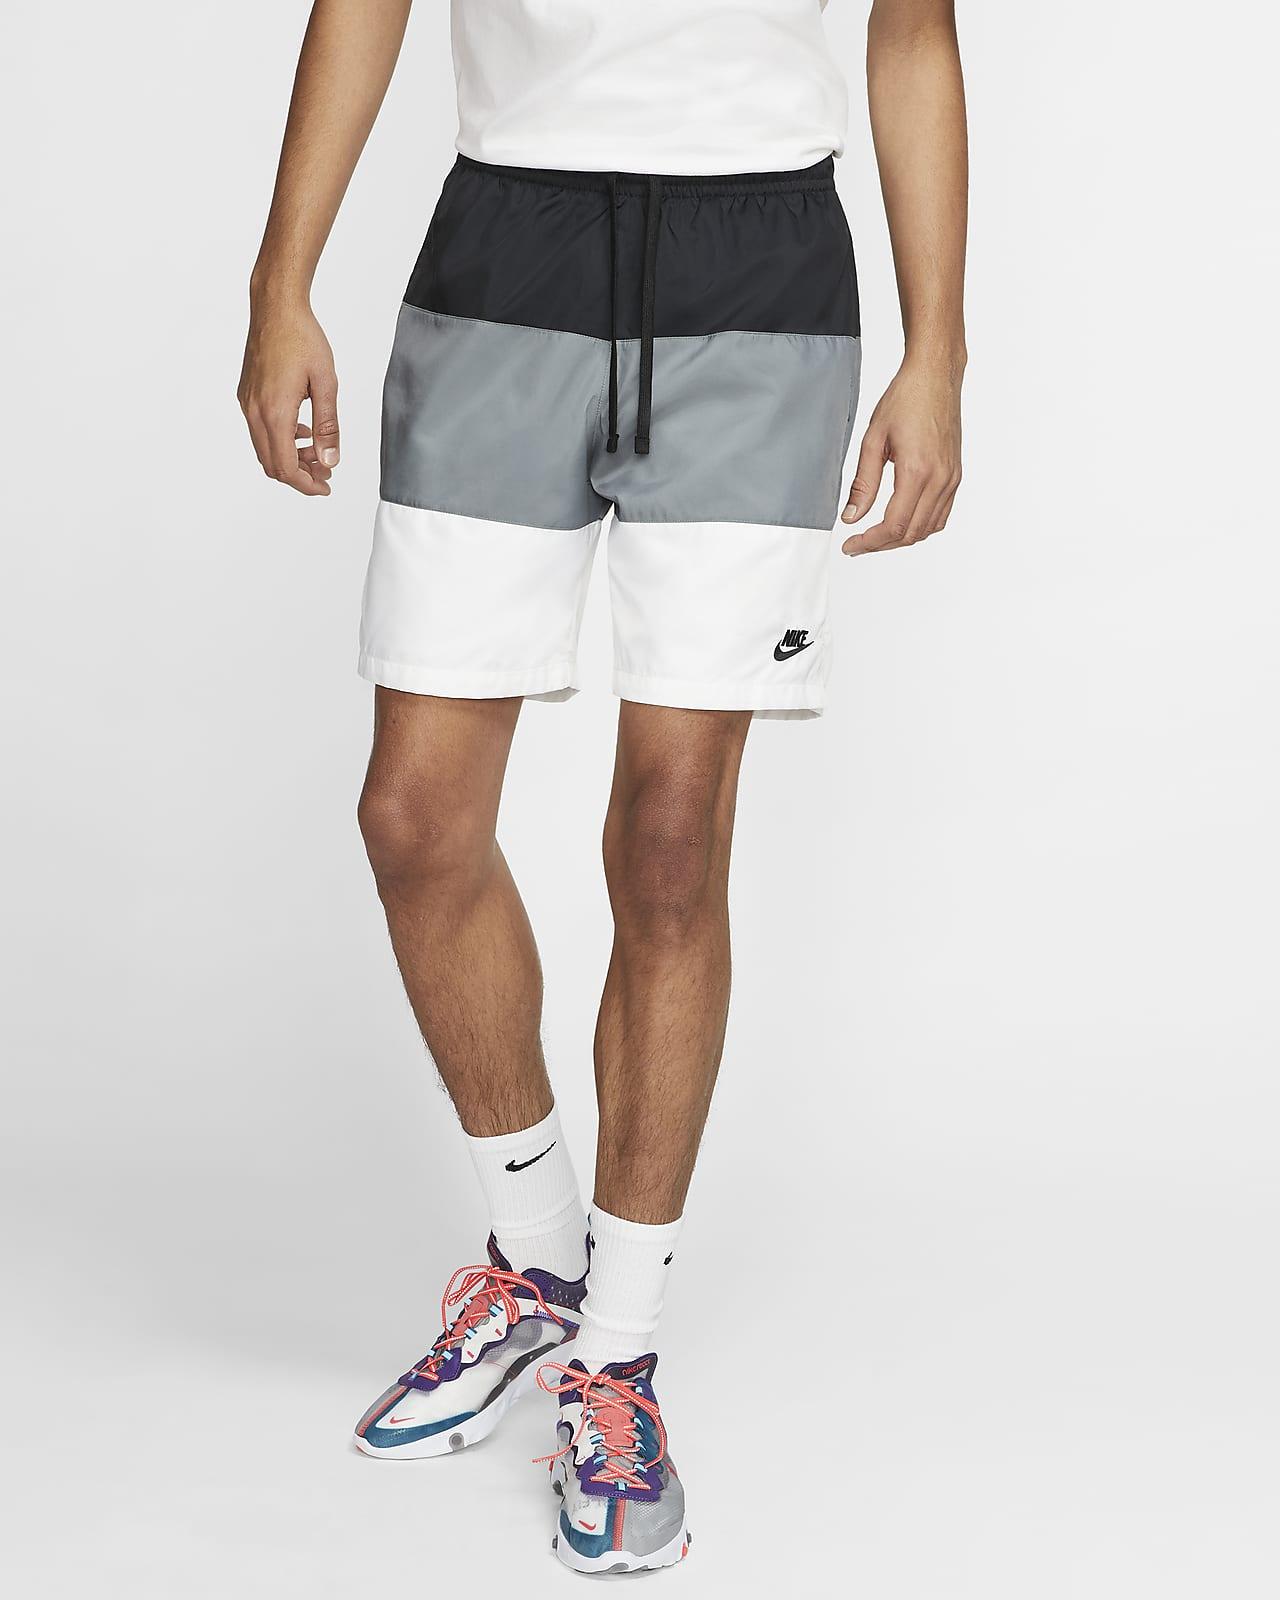 Nike Sportswear City Edition Men's Woven Shorts